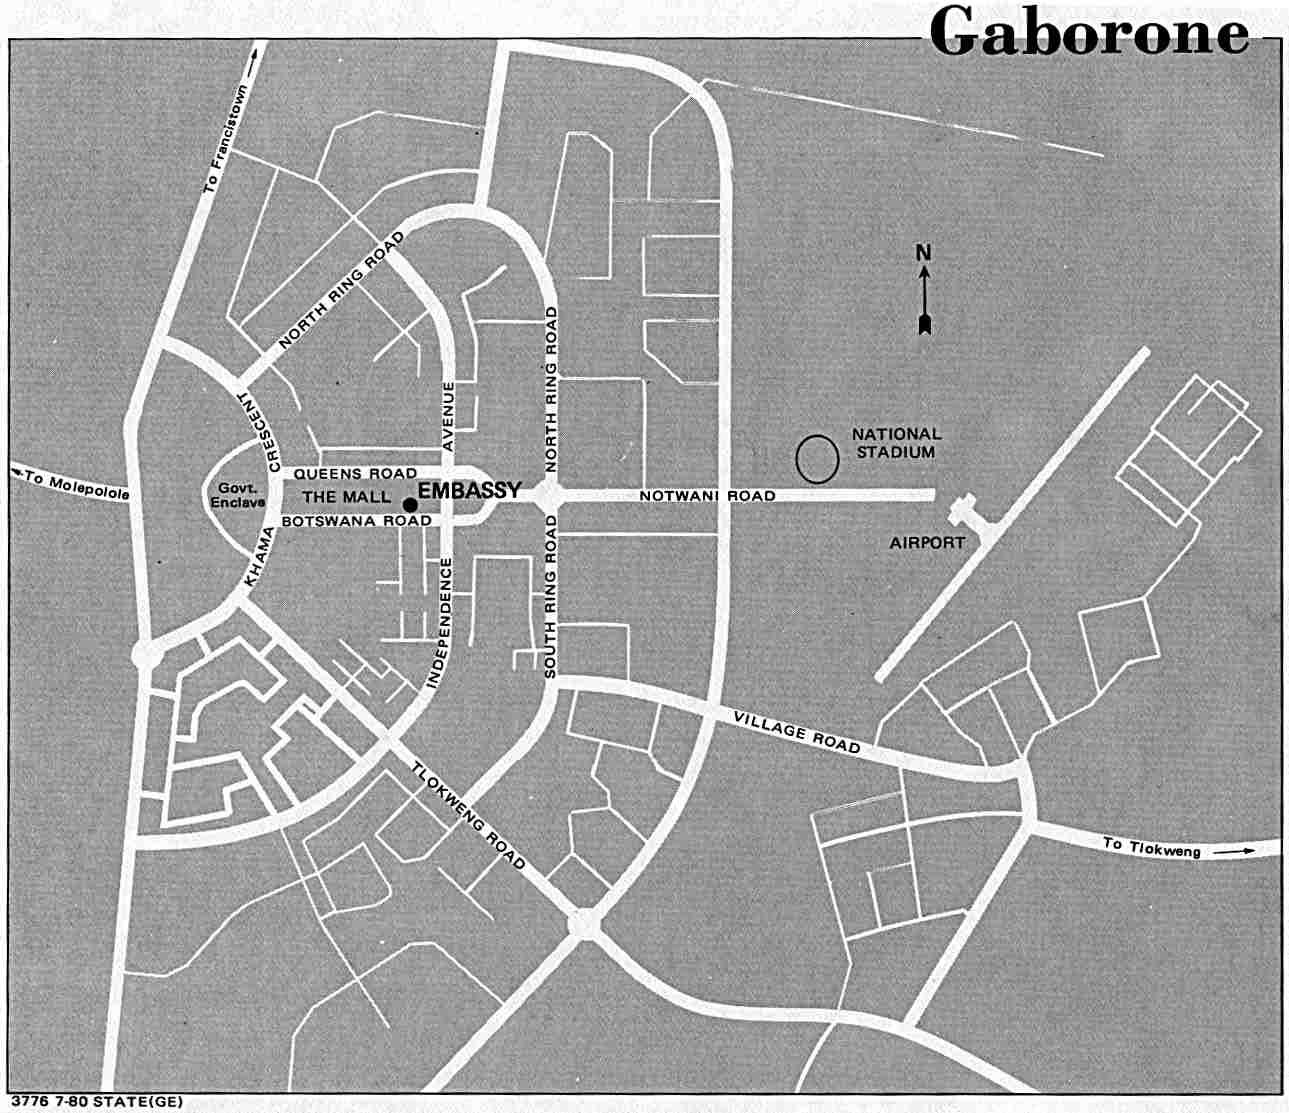 map of gaborone city botswana Botswana Maps Perry Castaneda Map Collection Ut Library Online map of gaborone city botswana